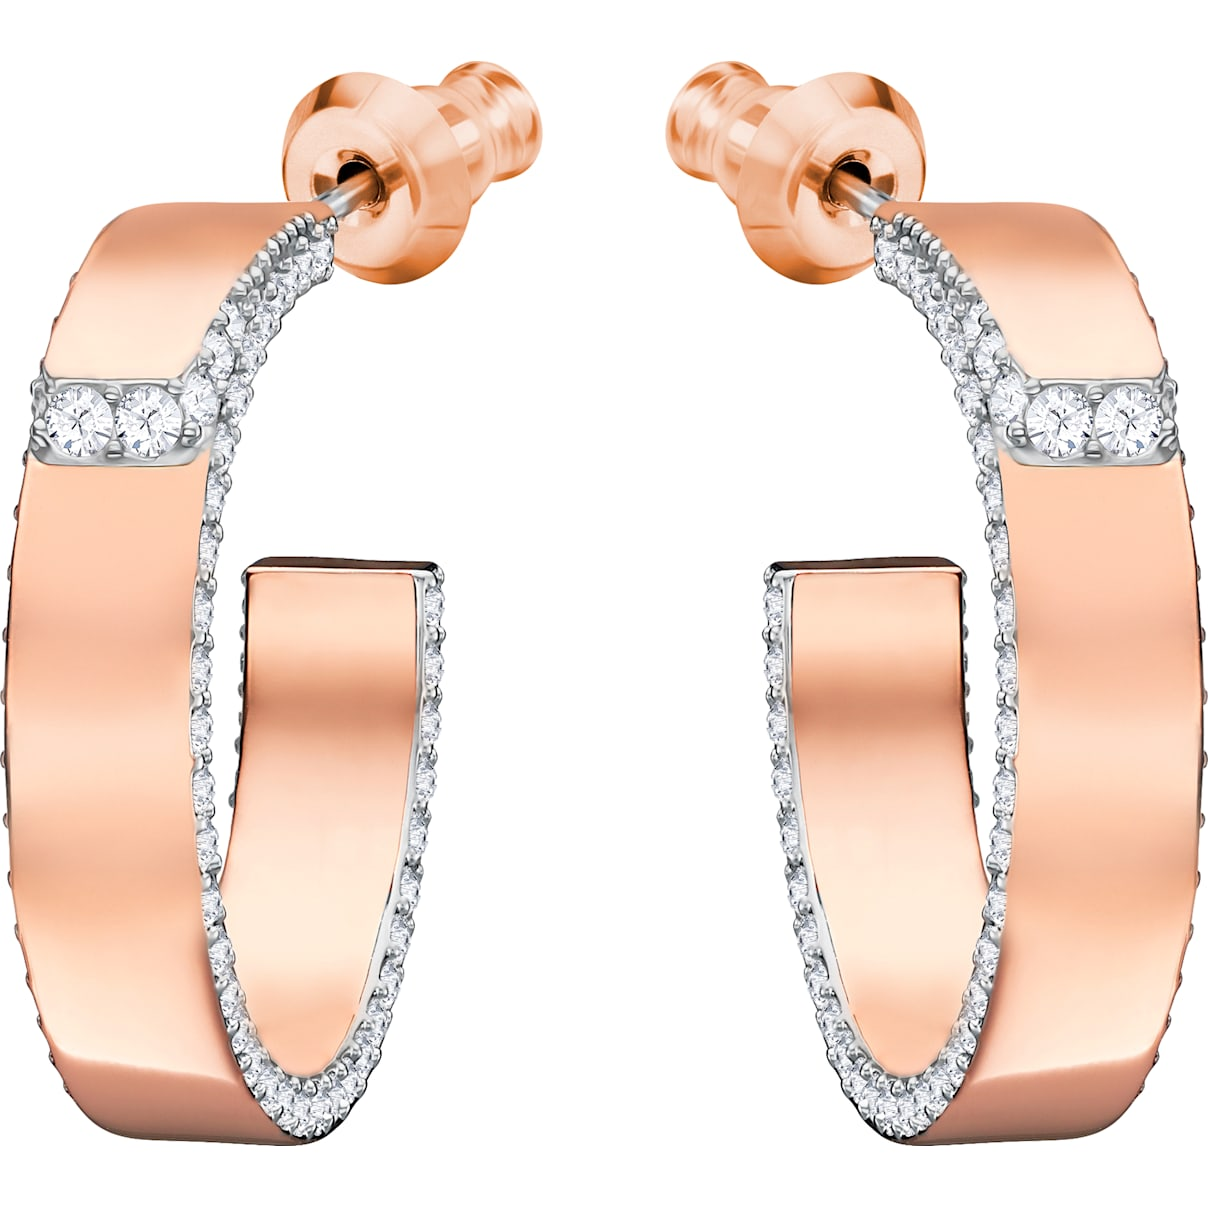 Swarovski Lakeside Pierced Earrings, White, Rose-gold tone plated